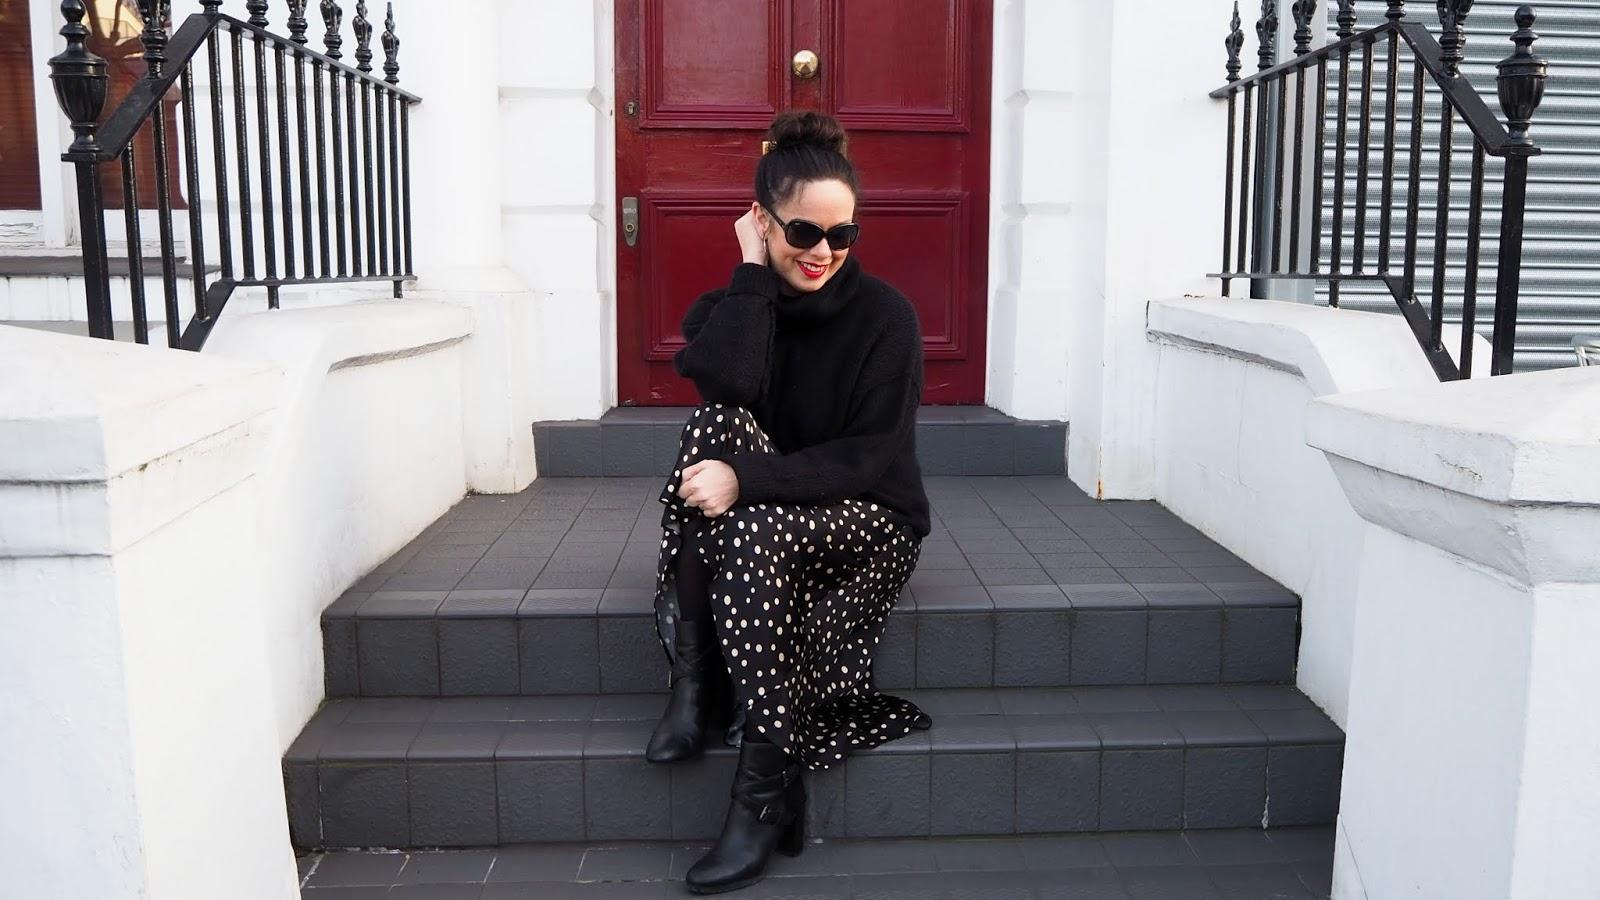 black turtleneck jumper and satin polka dot skirt with boots